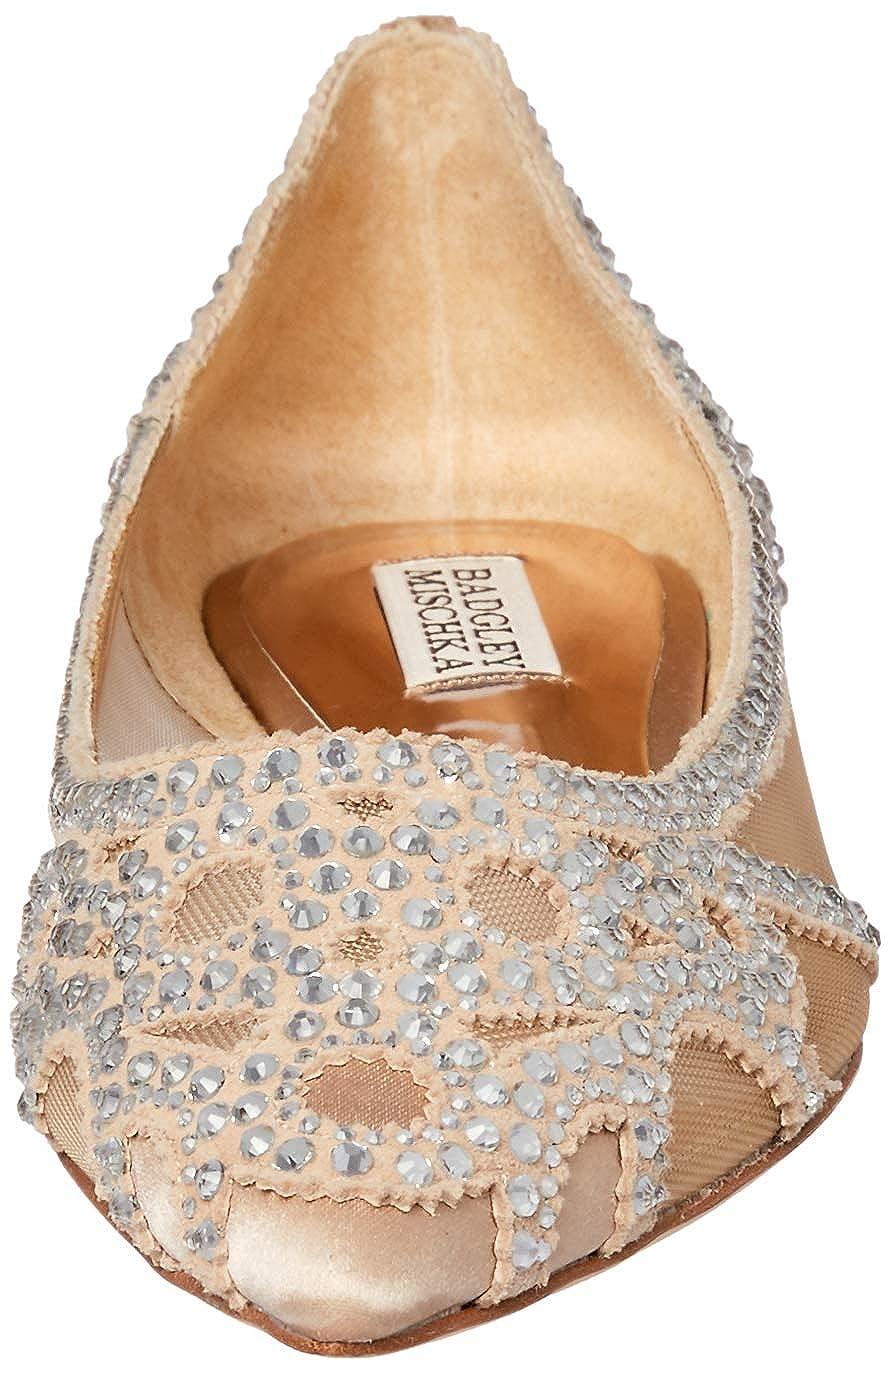 a0959a1a3aee Amazon.com  Badgley Mischka Women s Gigi Pointed Toe Flat  Shoes